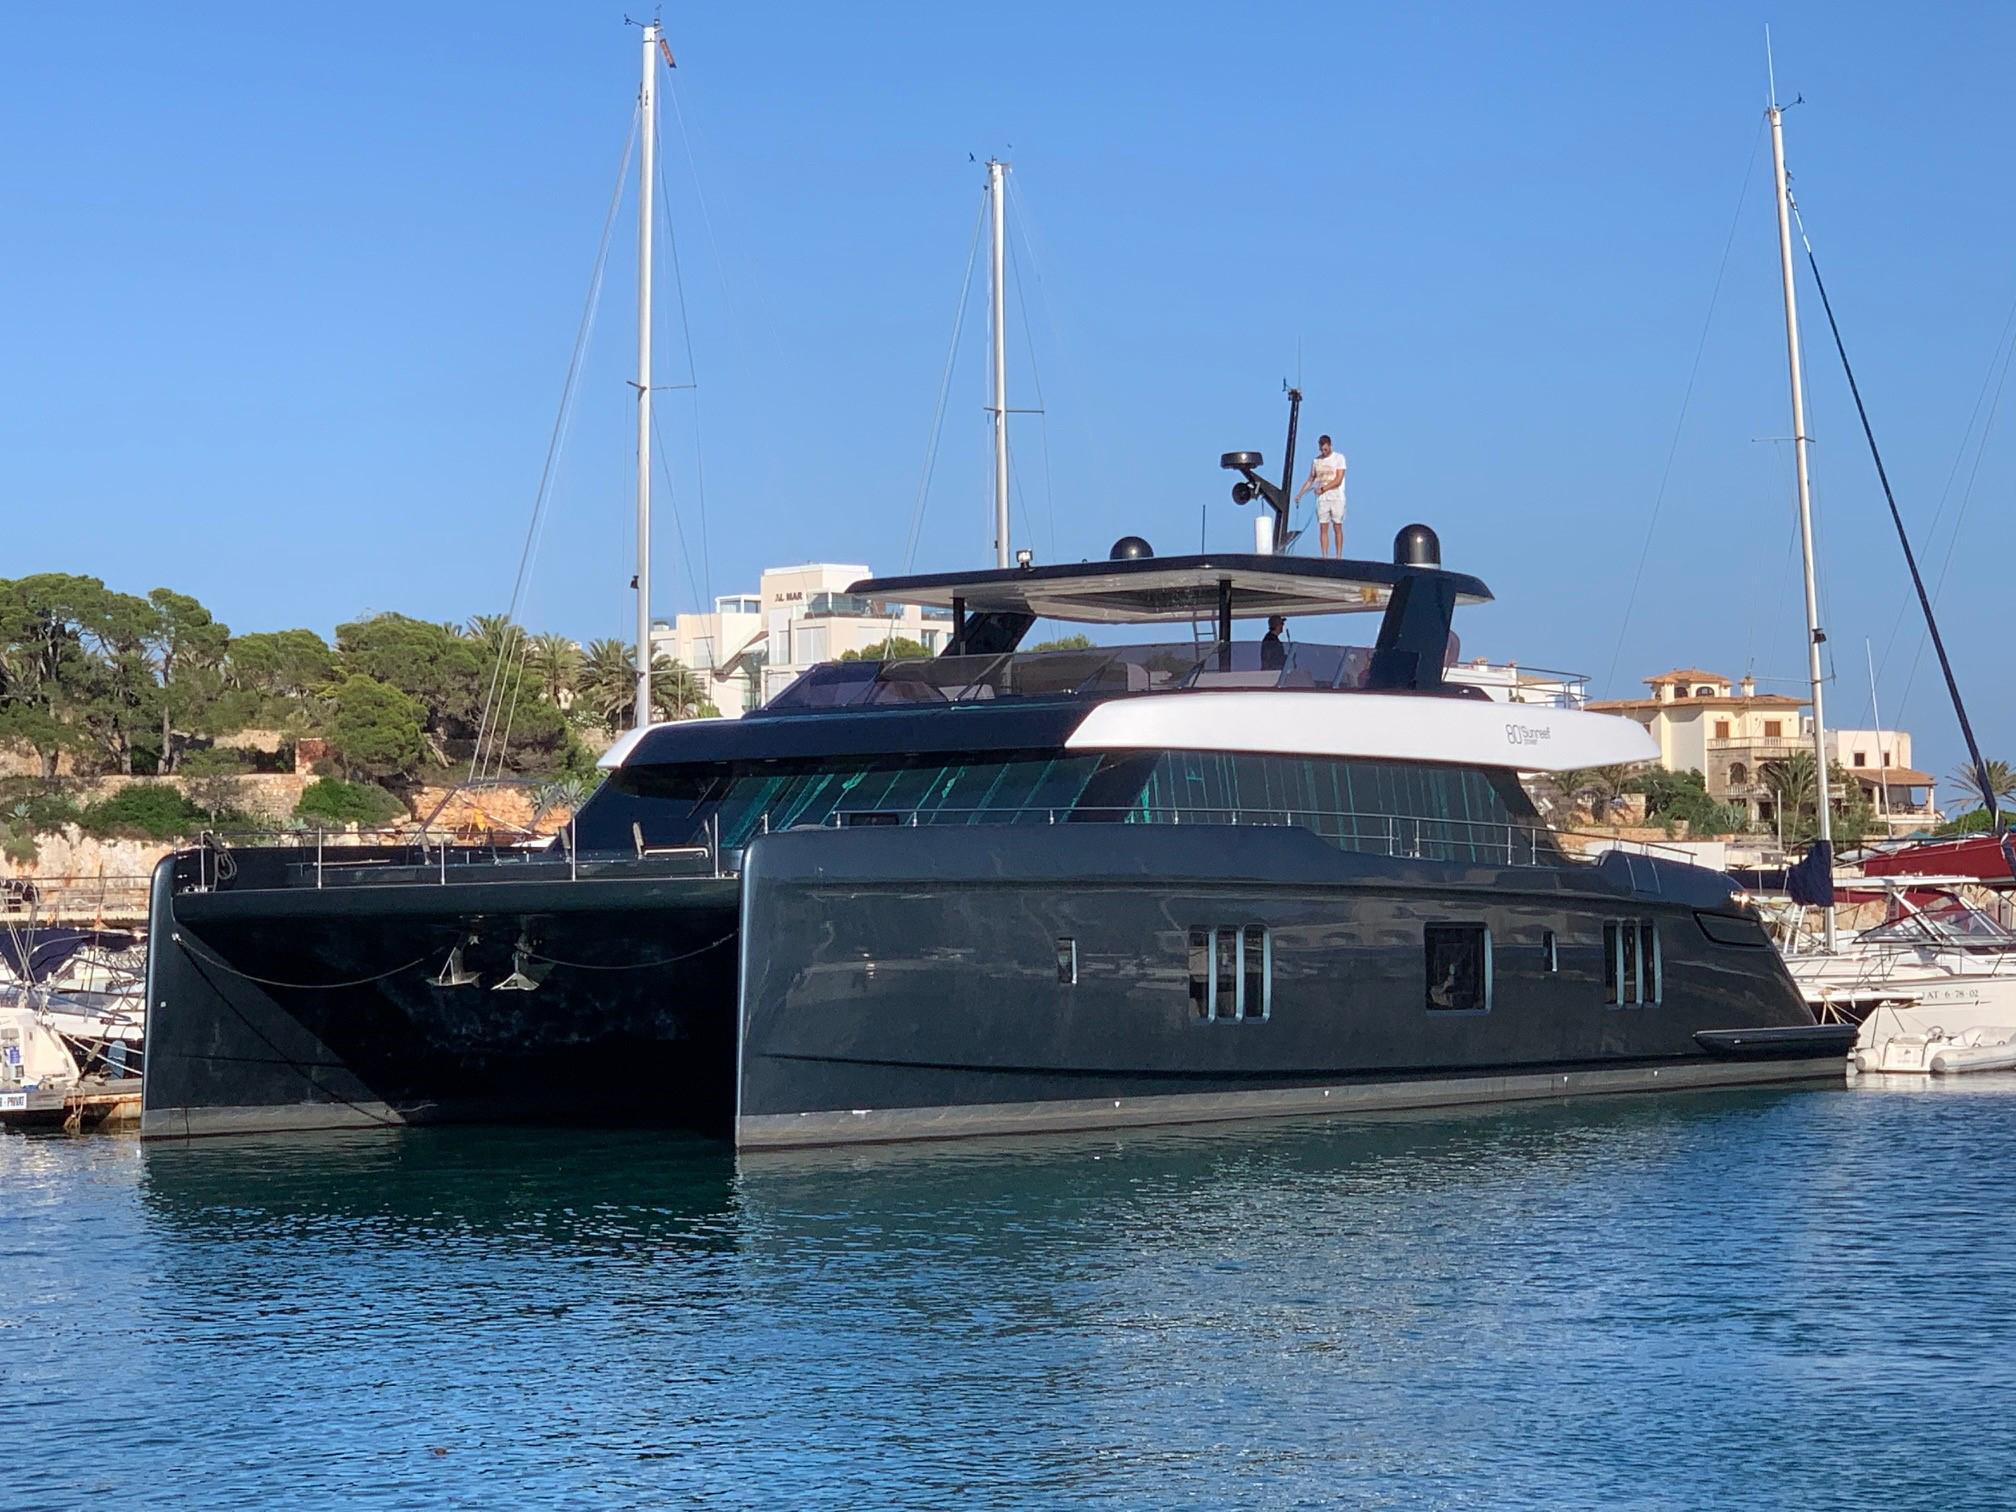 Rafa's new boat